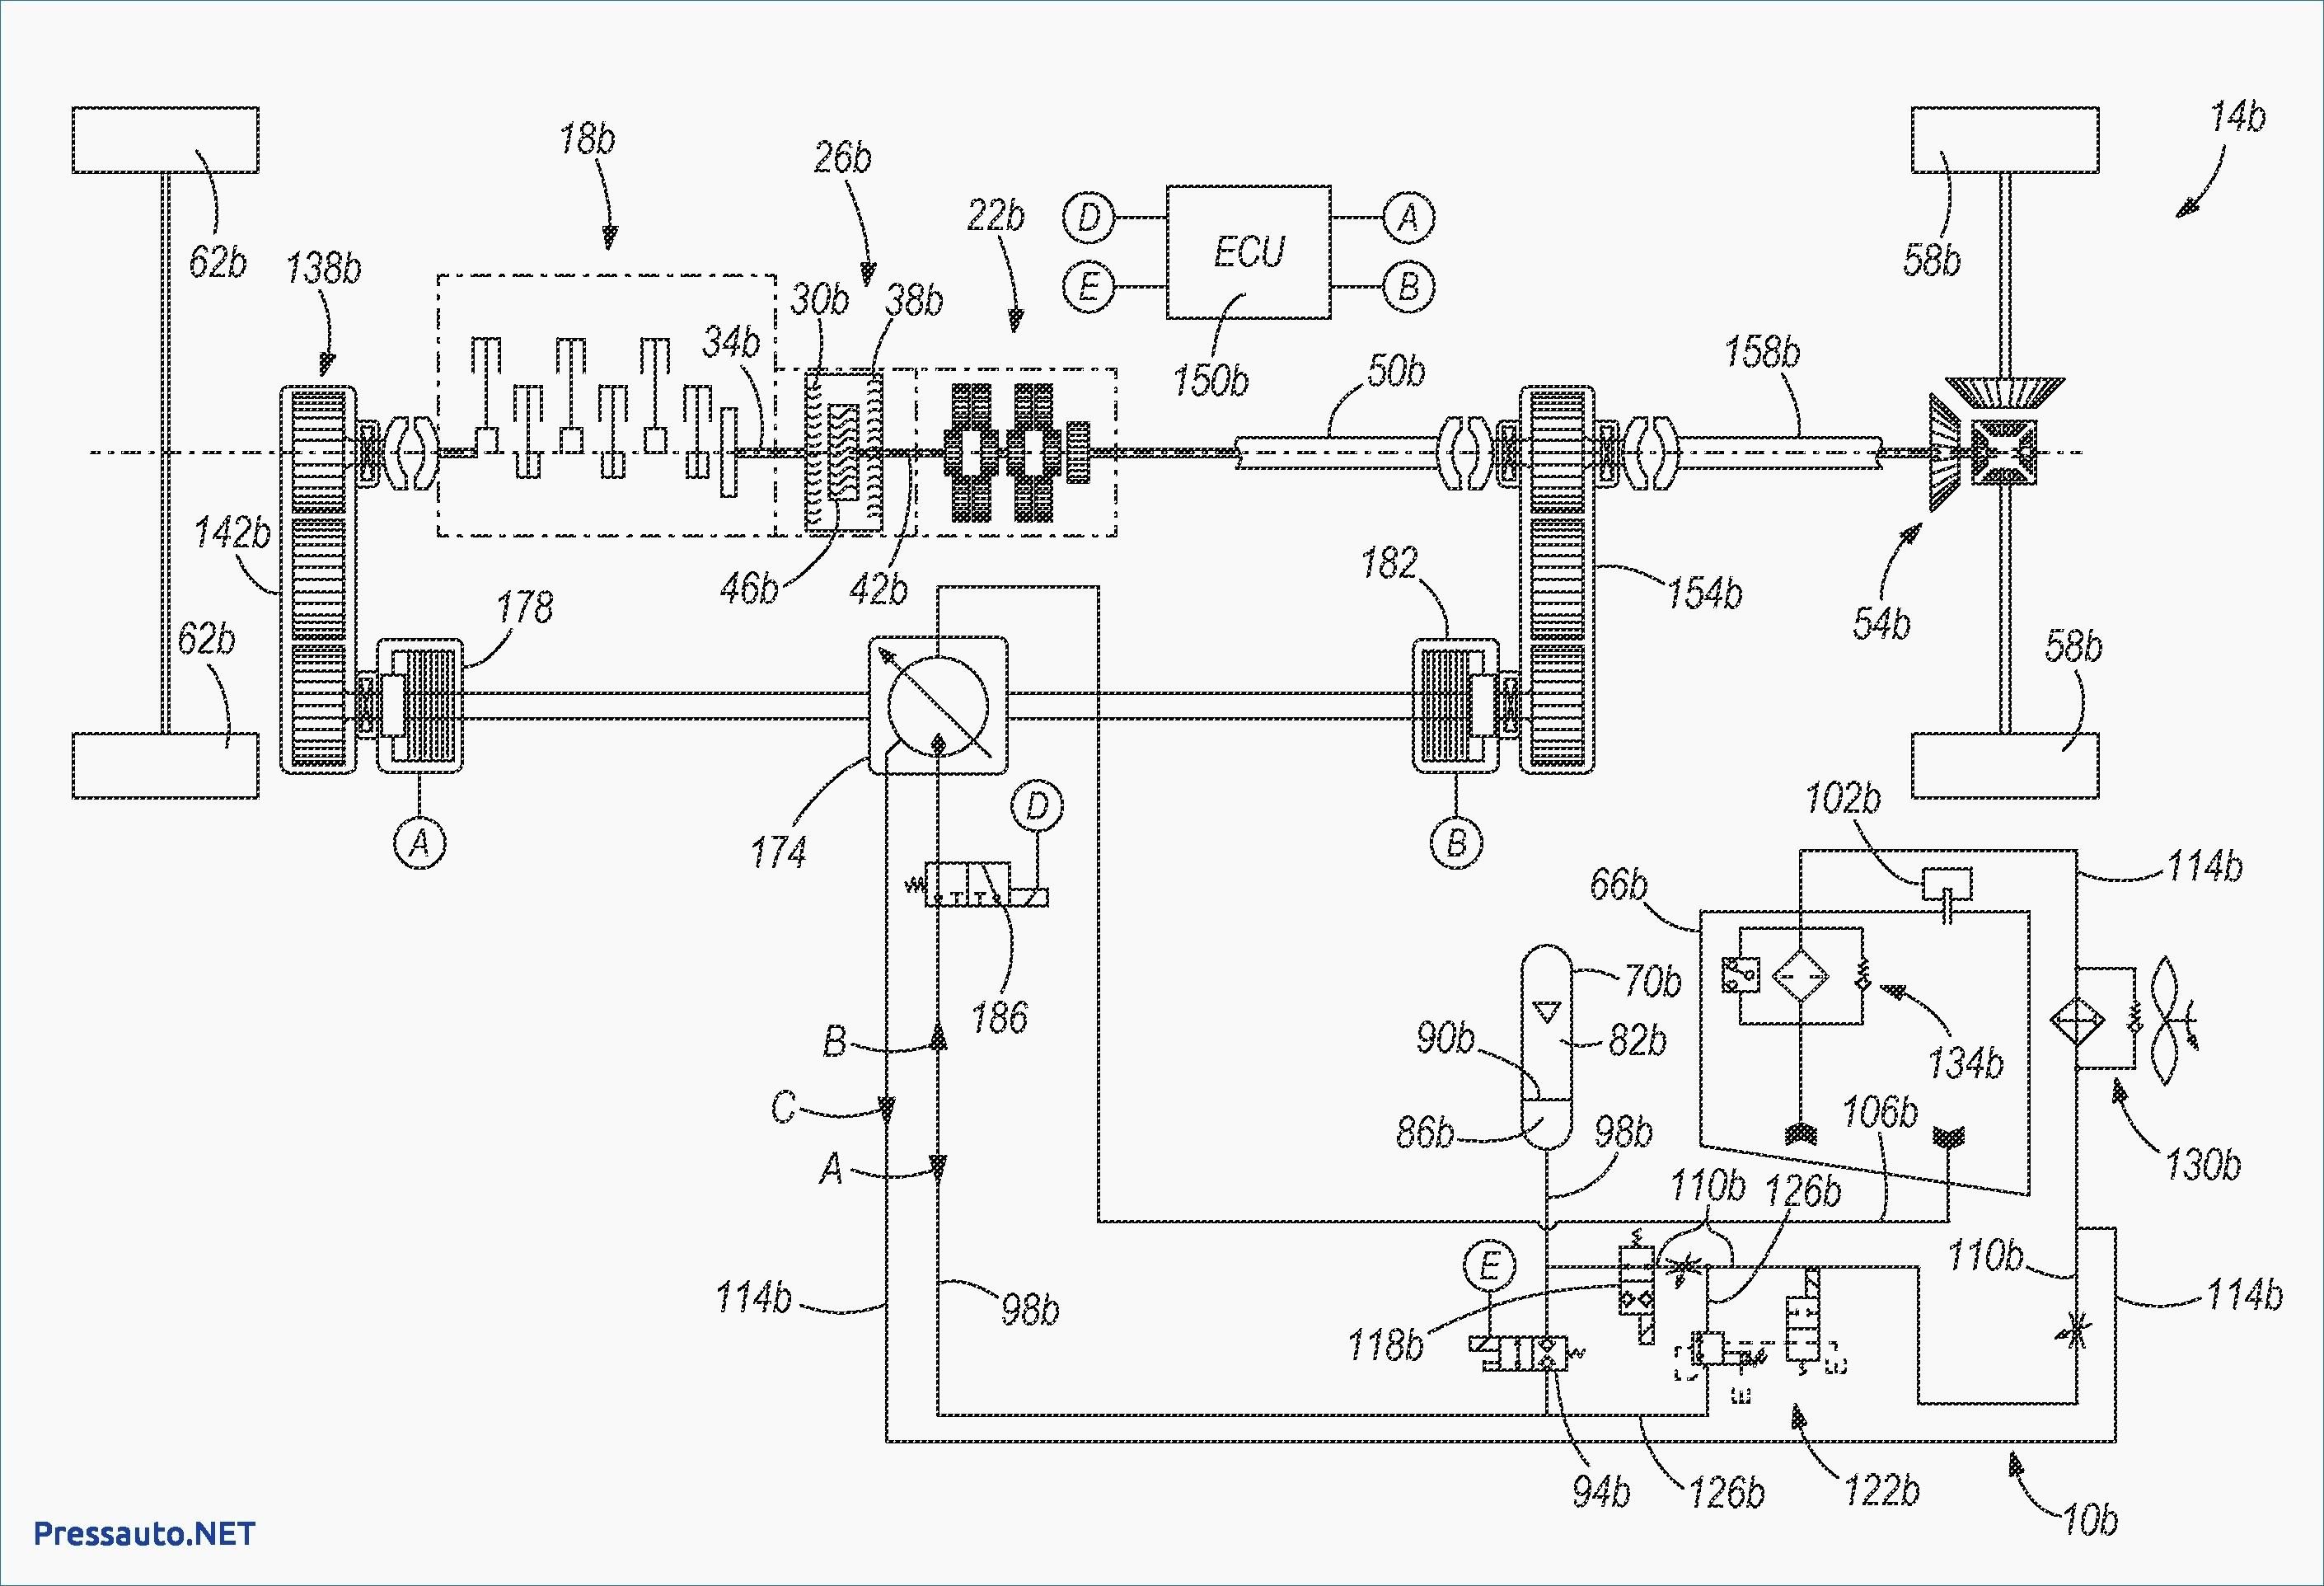 medium resolution of wiring diagram mahindra 7010 wiring diagram centre wiring diagram mahindra 475 wiring diagrammahindra 2216 wiring diagram